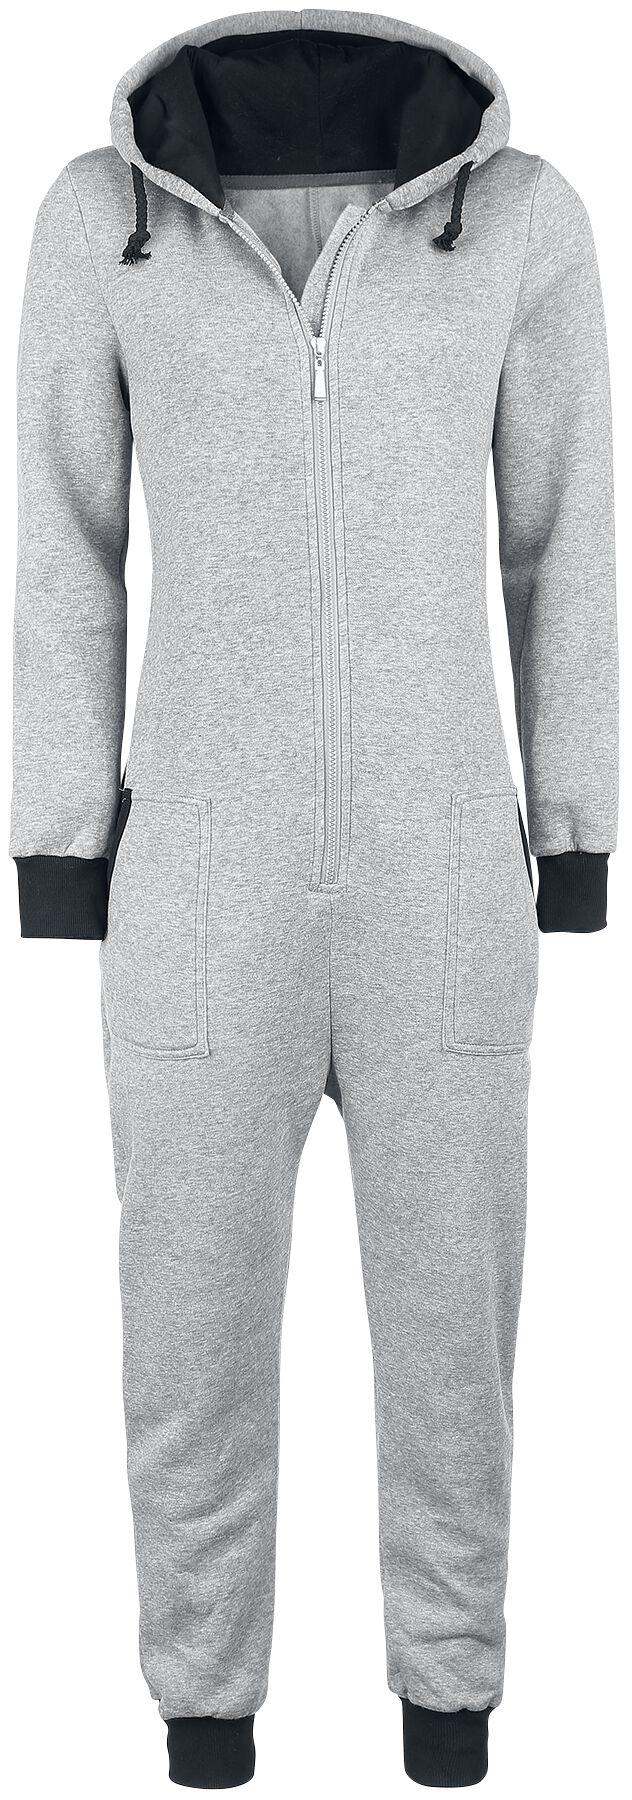 Image of   Forplay Jumpsuit Jumpsuit grå